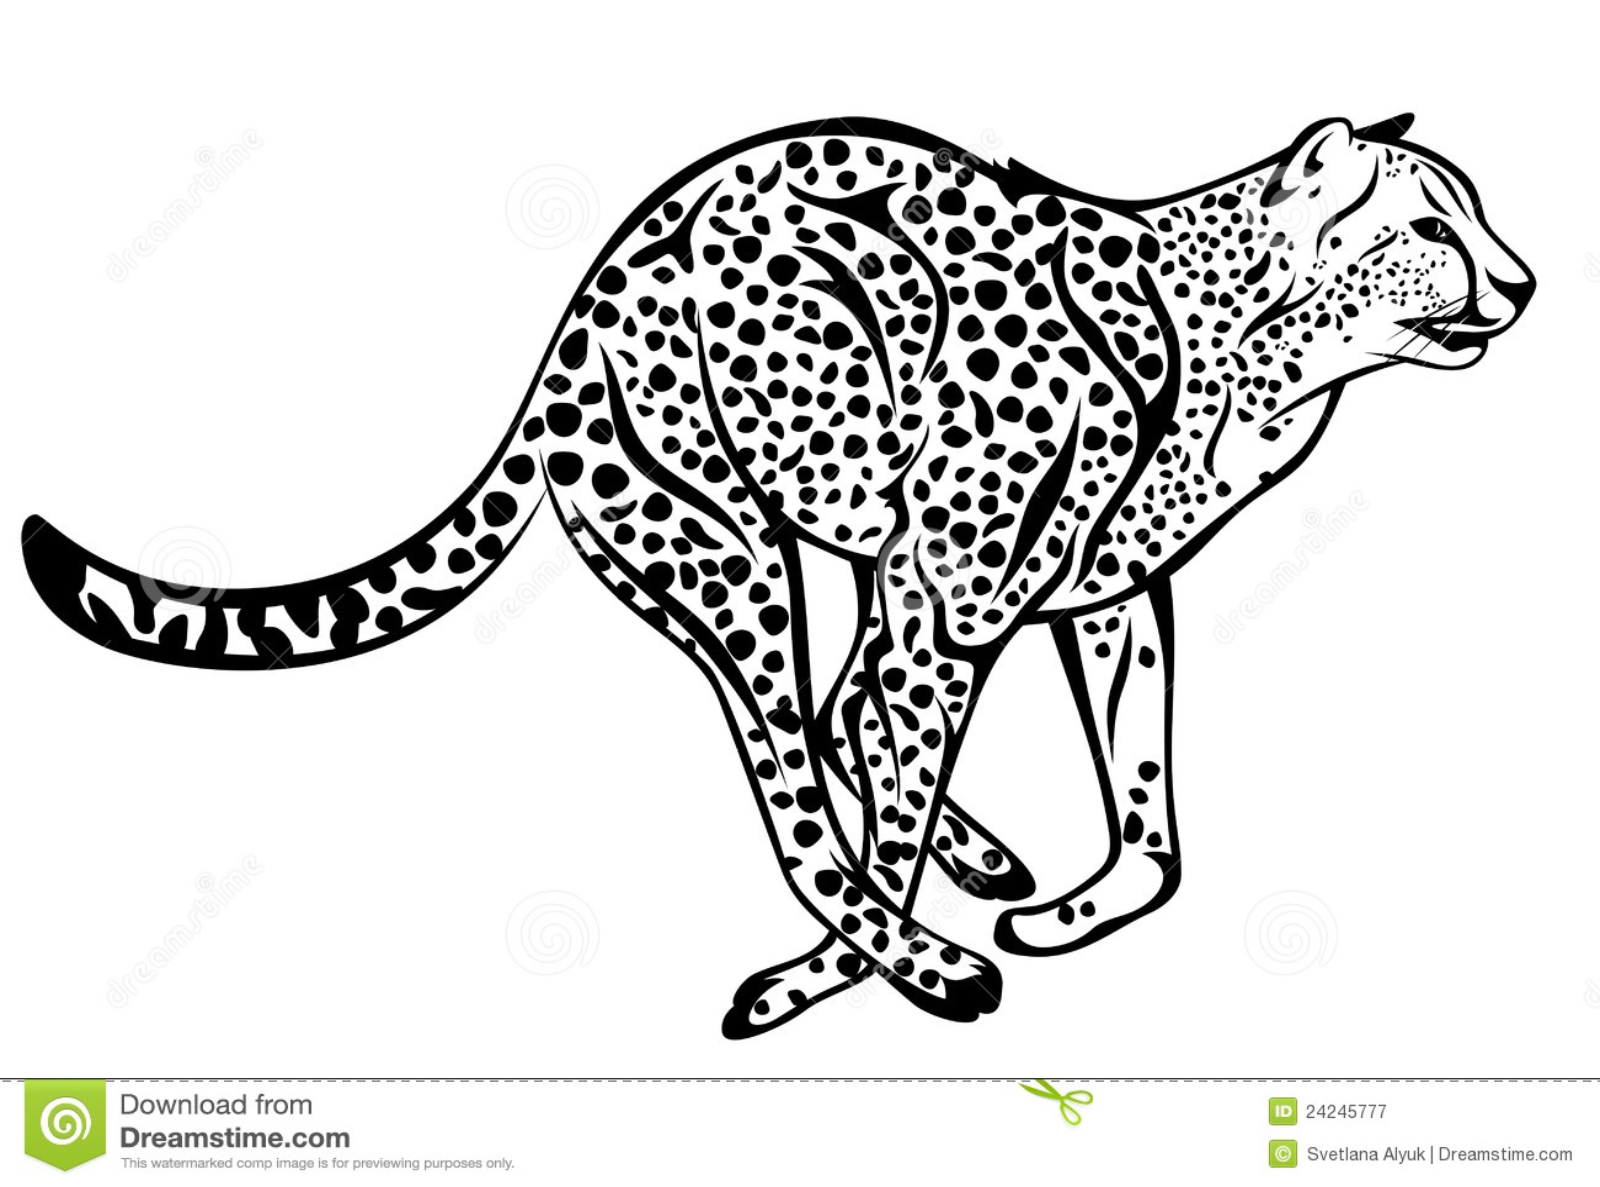 Baby Cheetah Clipart Black And White Cheetah Clipart Black AndBaby Cheetah Clipart Black And White